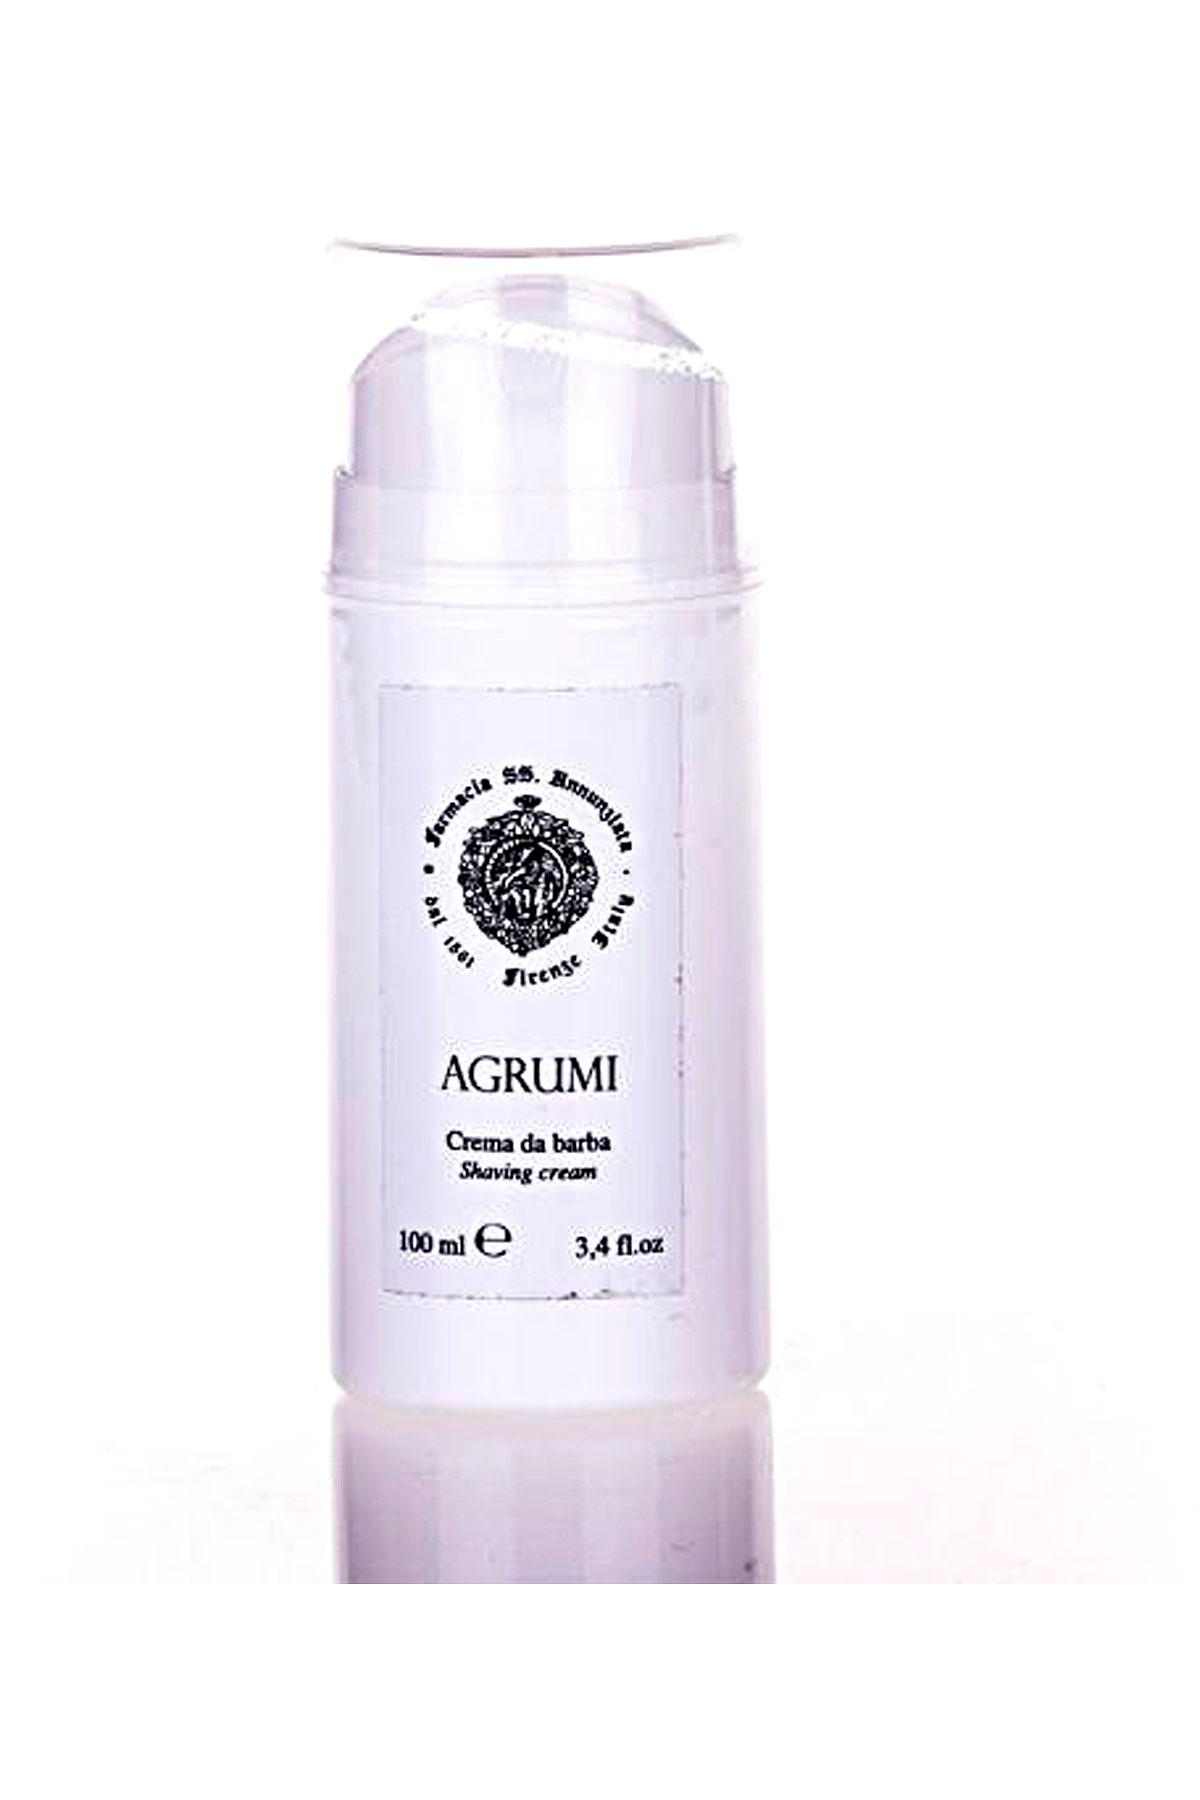 Farmacia Ss Annunziata 1561 Shave for Men, Airless Shave Cream - Agrumi - 100 Ml, 2019, 100 ml